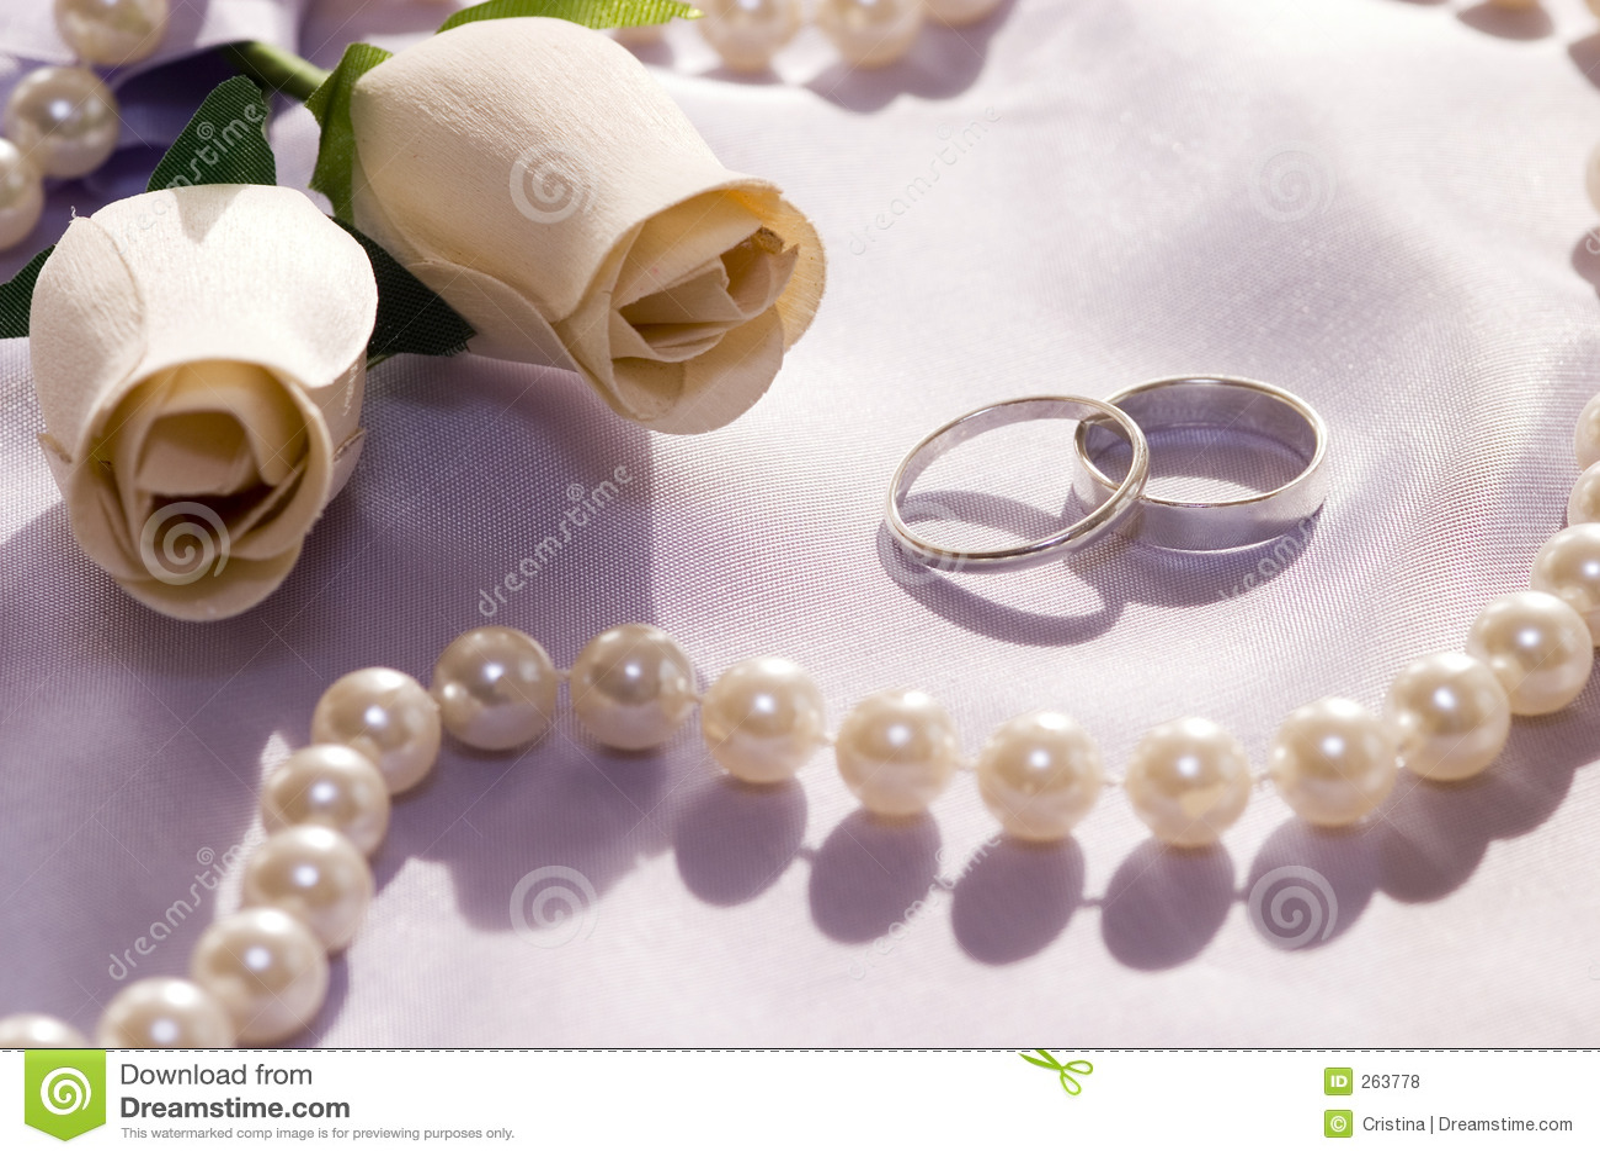 Royalty Free Stock Photos Wedding Still Life 2 Image263778